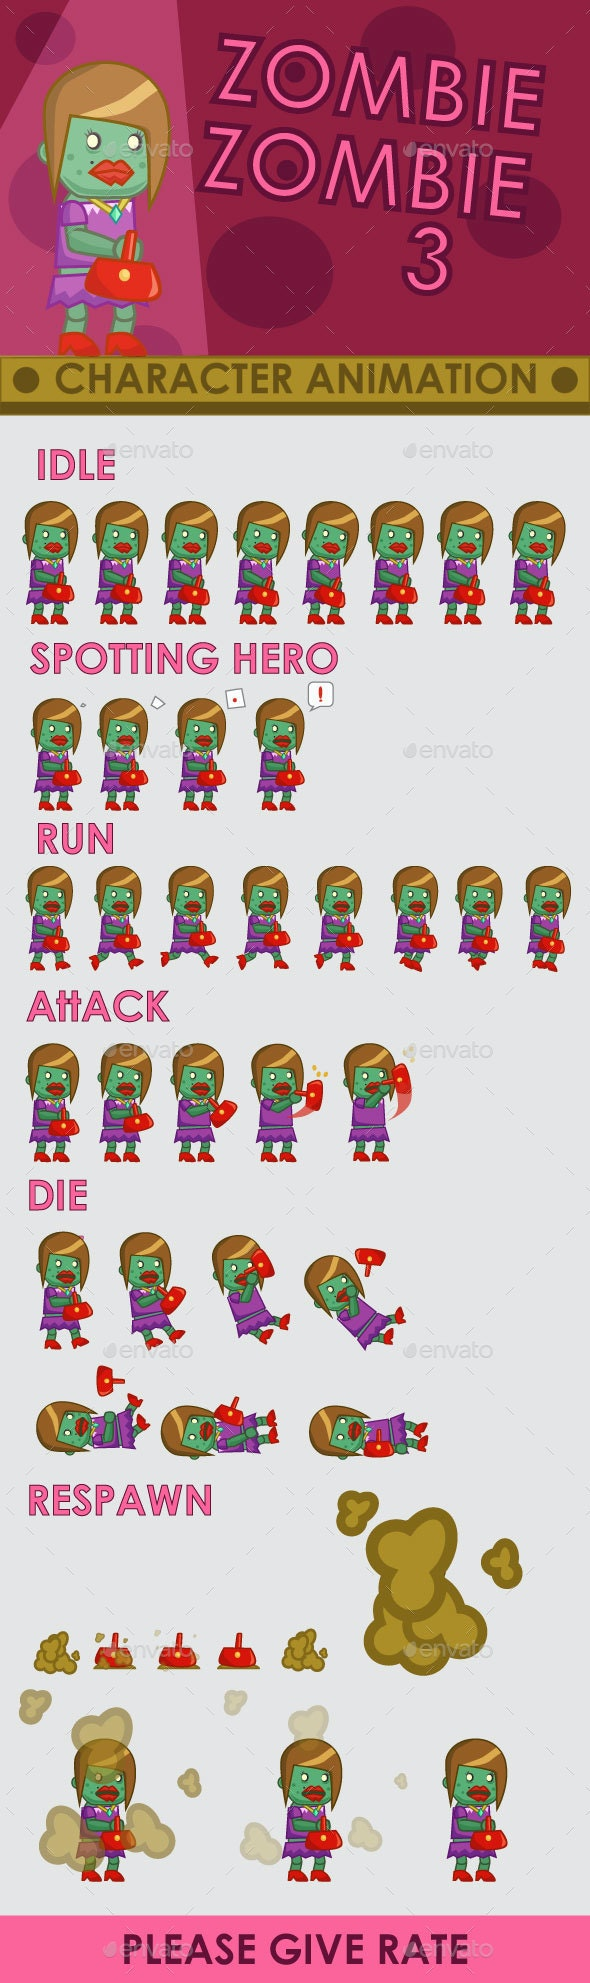 Zombie Enemy Sprite Sheet #3 - Sprites Game Assets